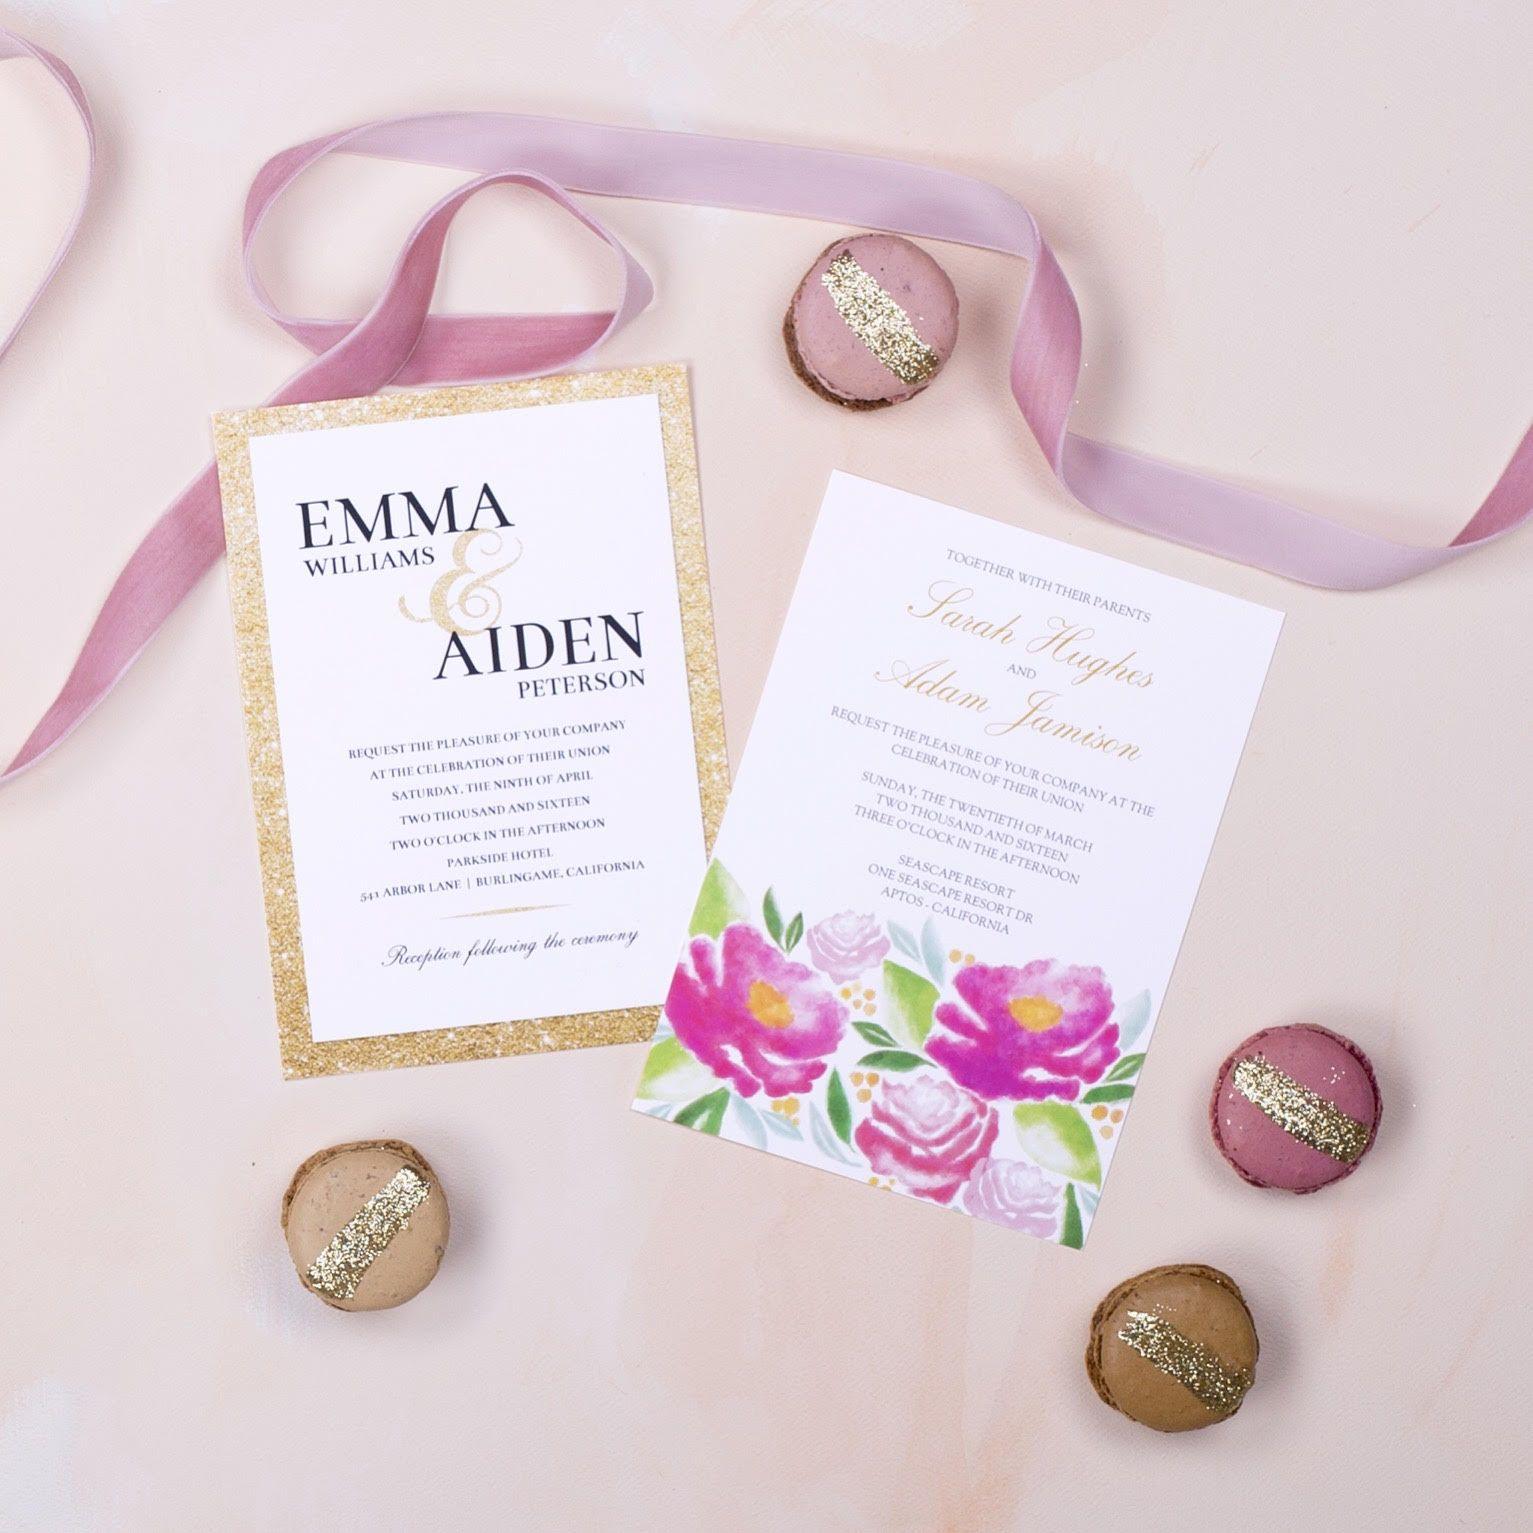 Mixbook giveaway cherish your memories unique weddings weddings